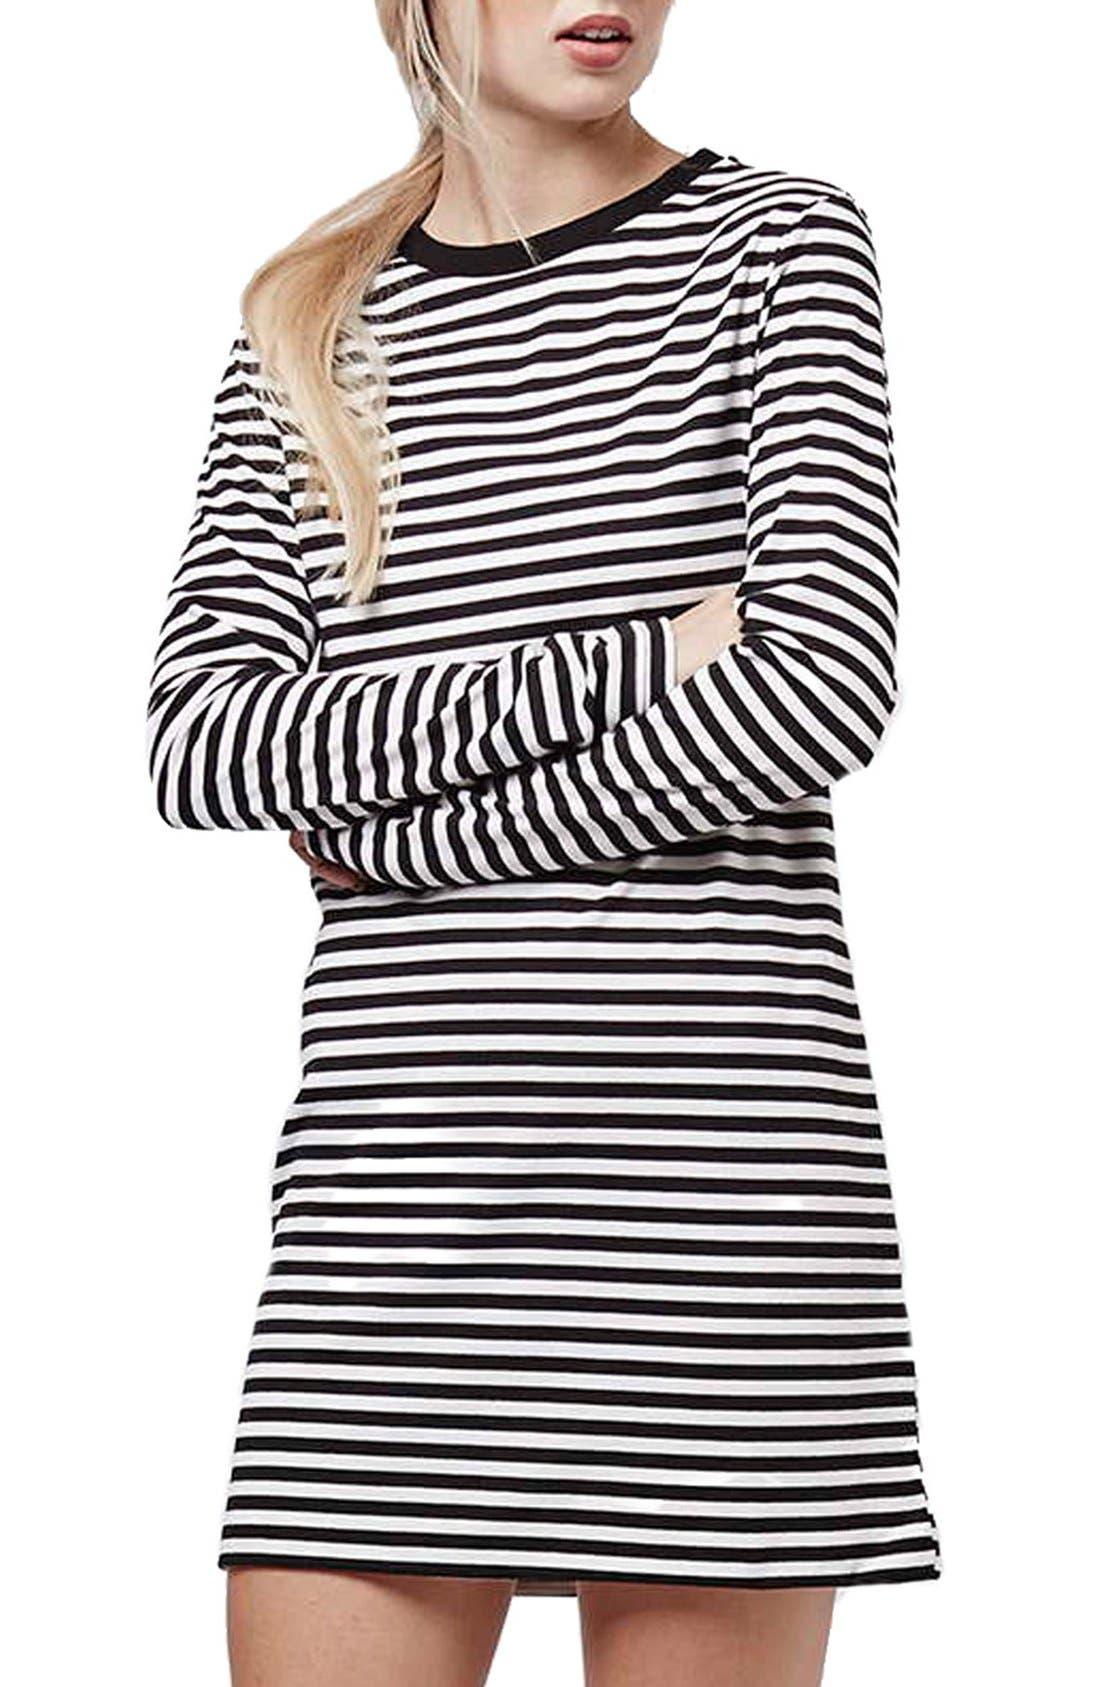 Alternate Image 1 Selected - Topshop Stripe Long Sleeve Tunic Dress